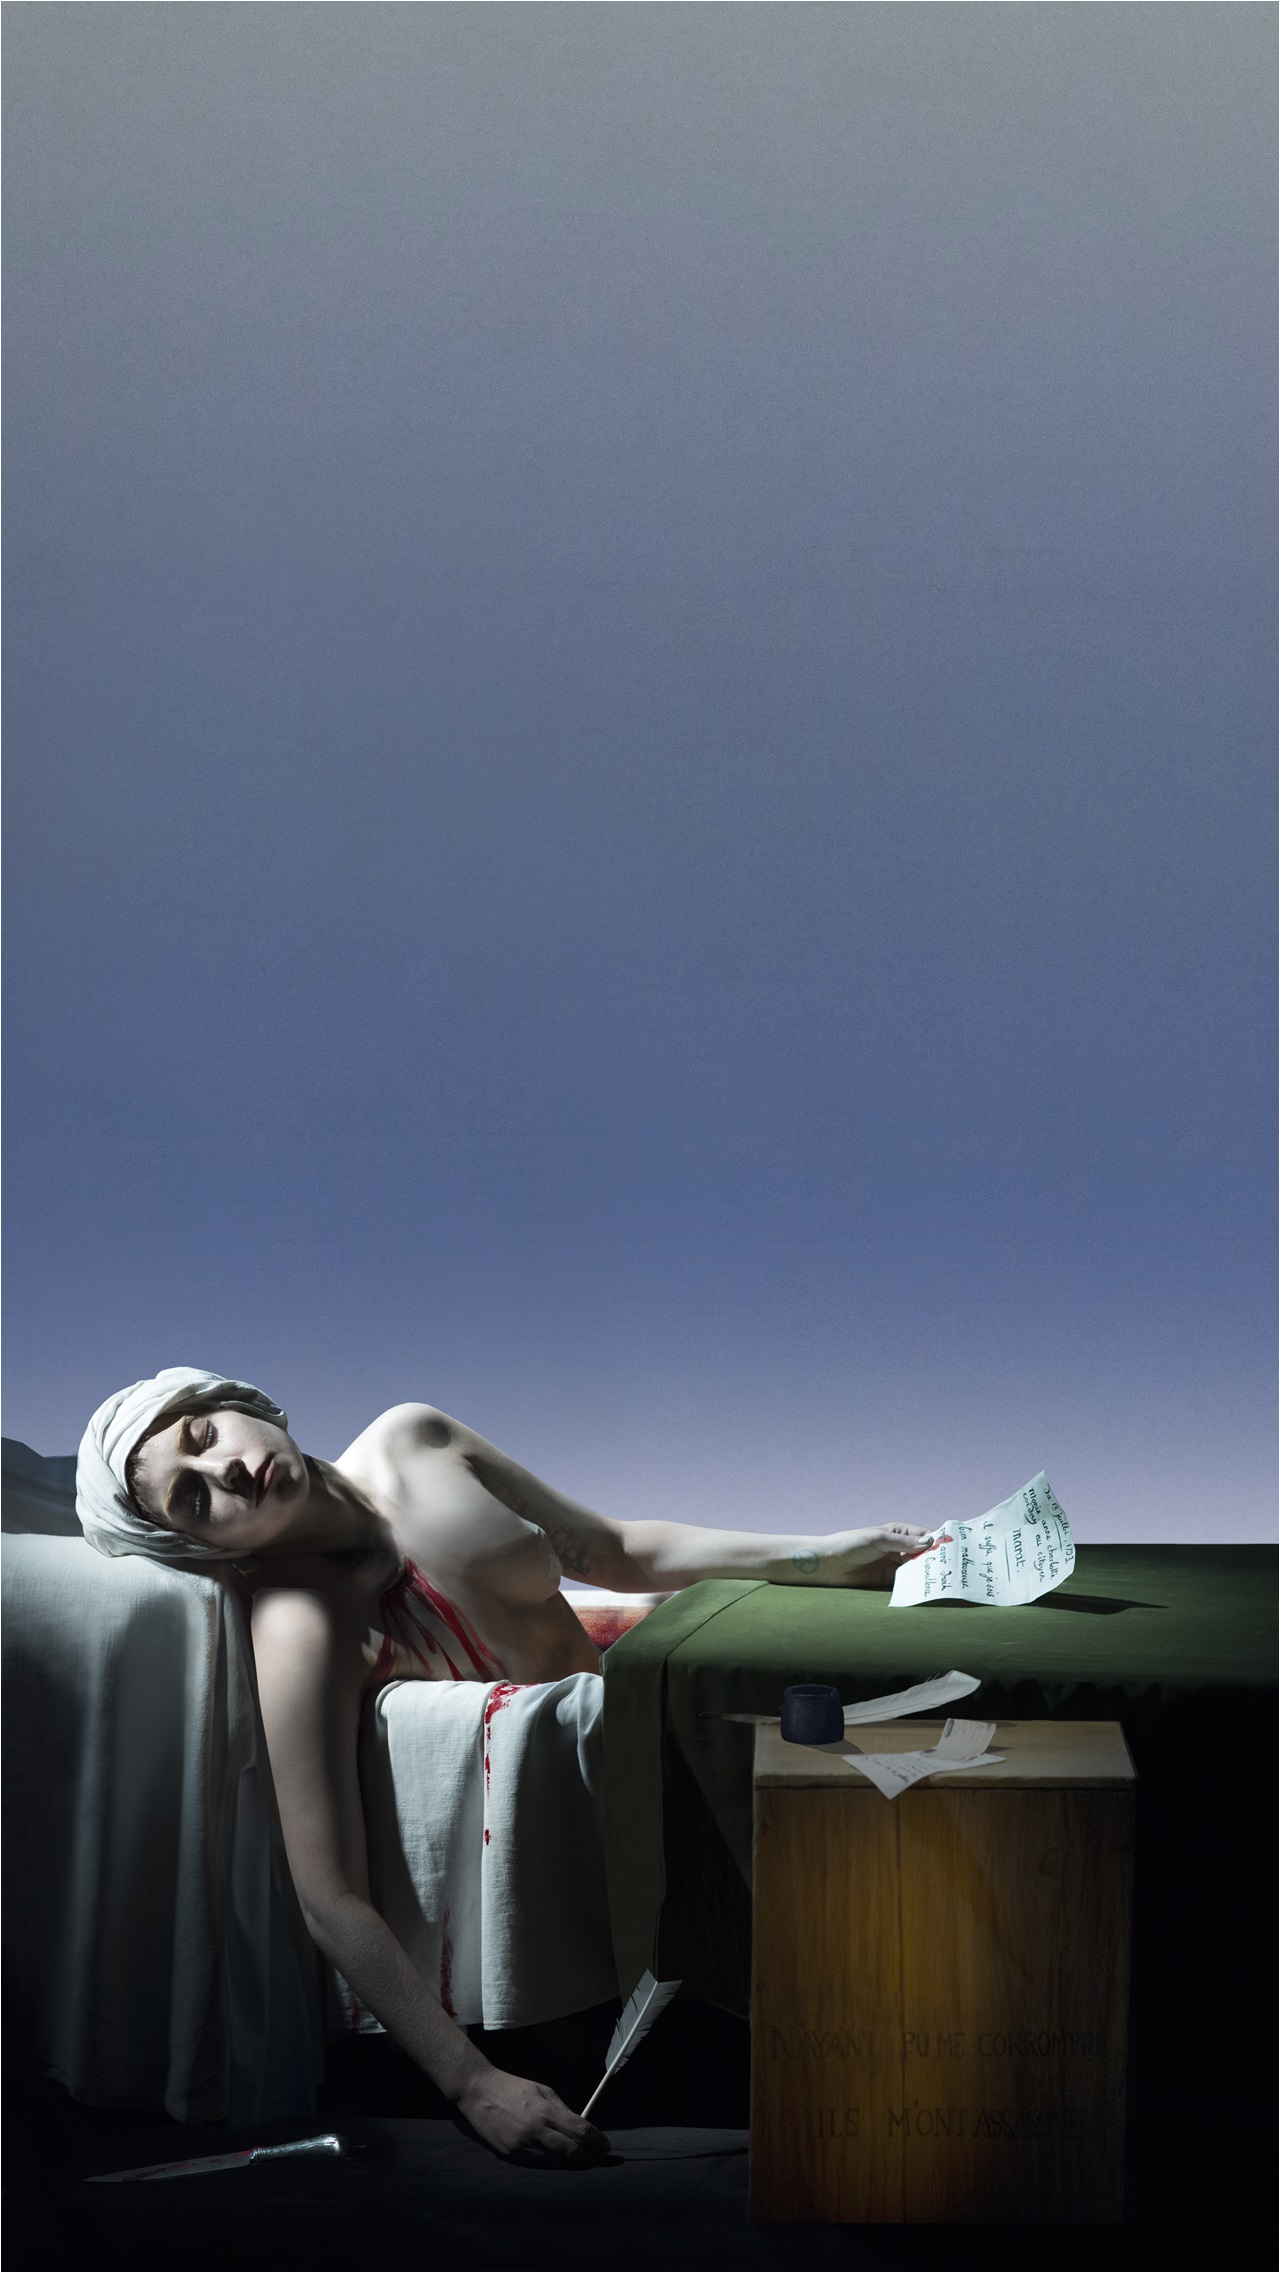 Painting Death Bathtub Art Basel Miami Beach 2014